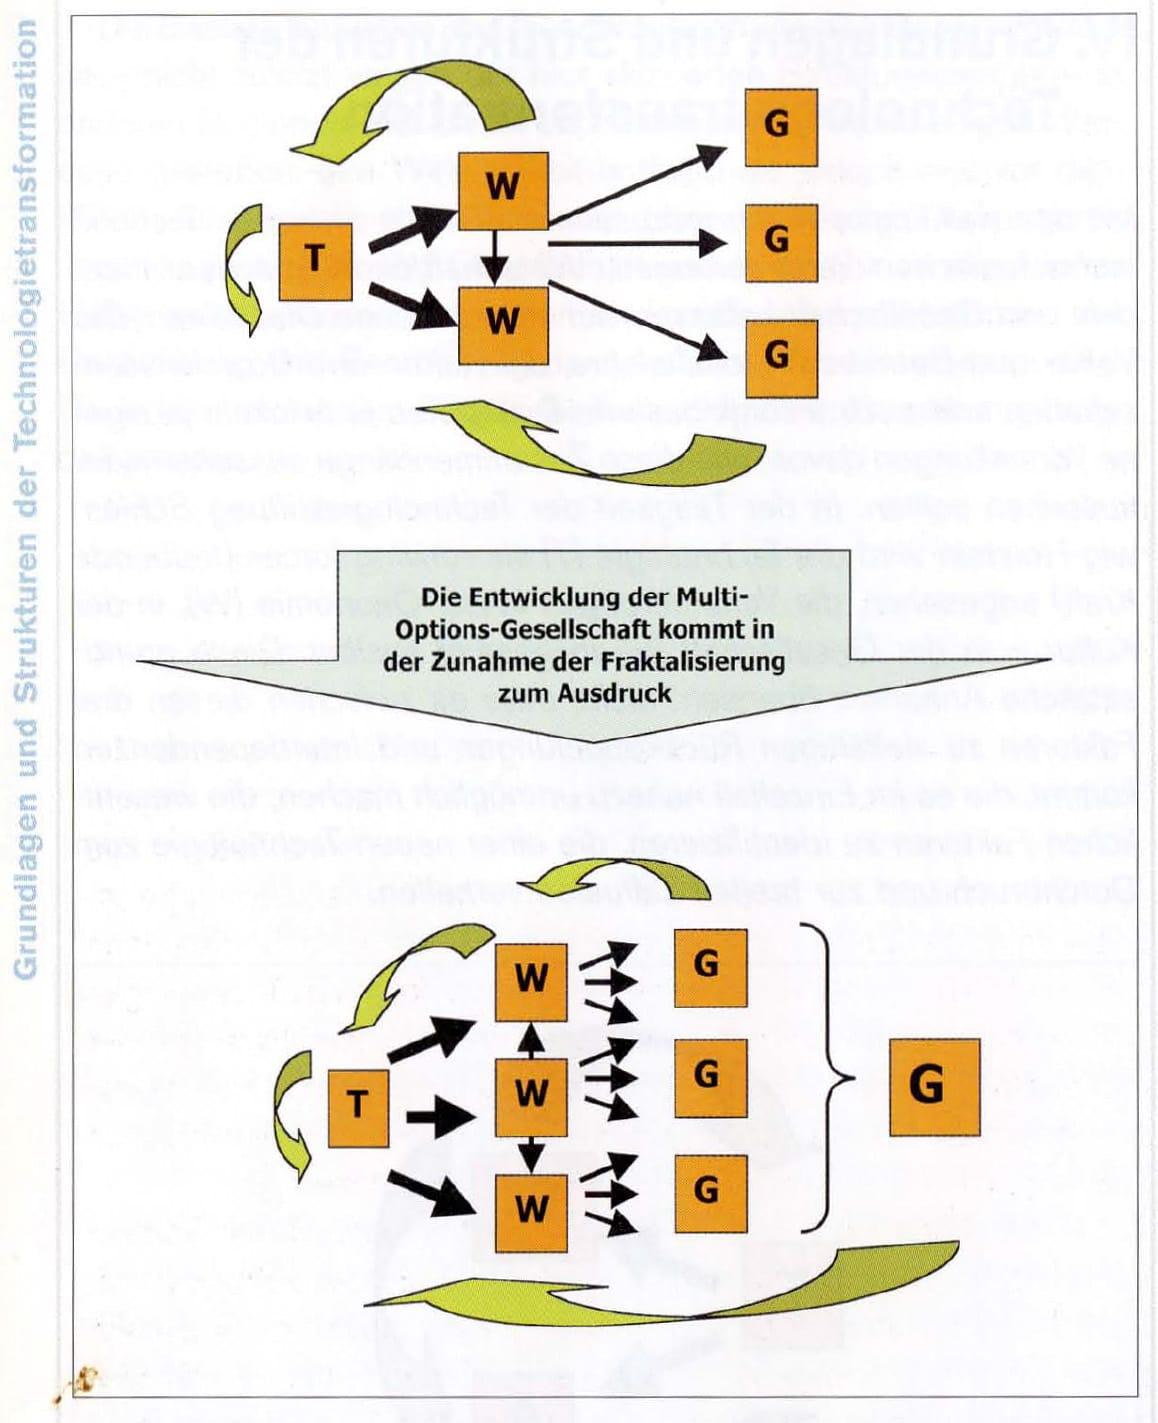 2000-09_KPF-TSH_Buch_Technologietransformation_05